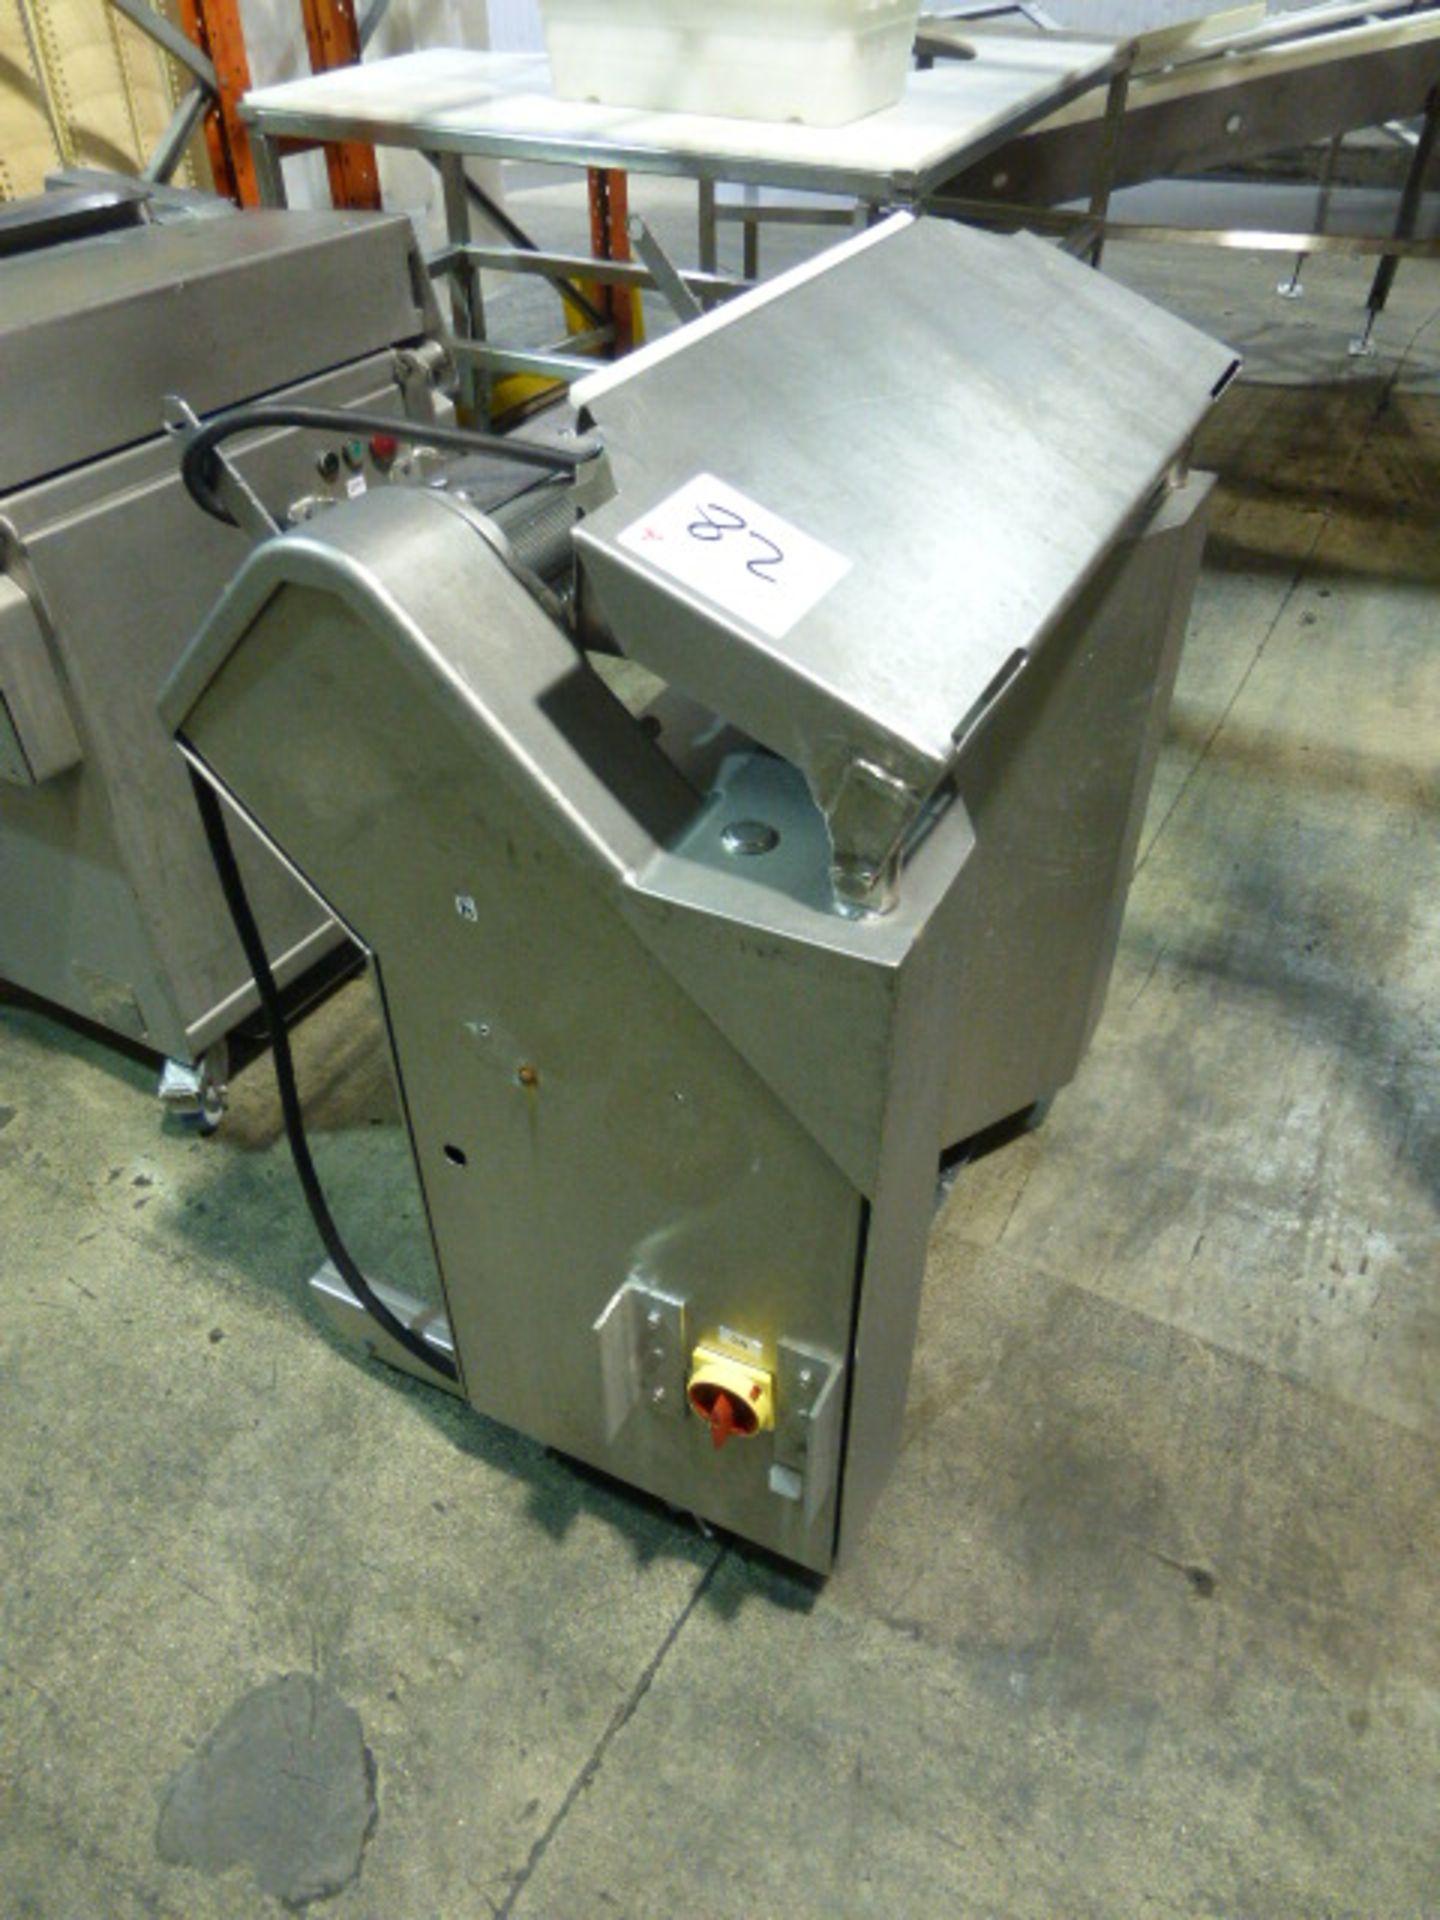 Lot 82 - Townsend membrane skinner, model 7600, ser. no. 2002. s/s, 20 in.